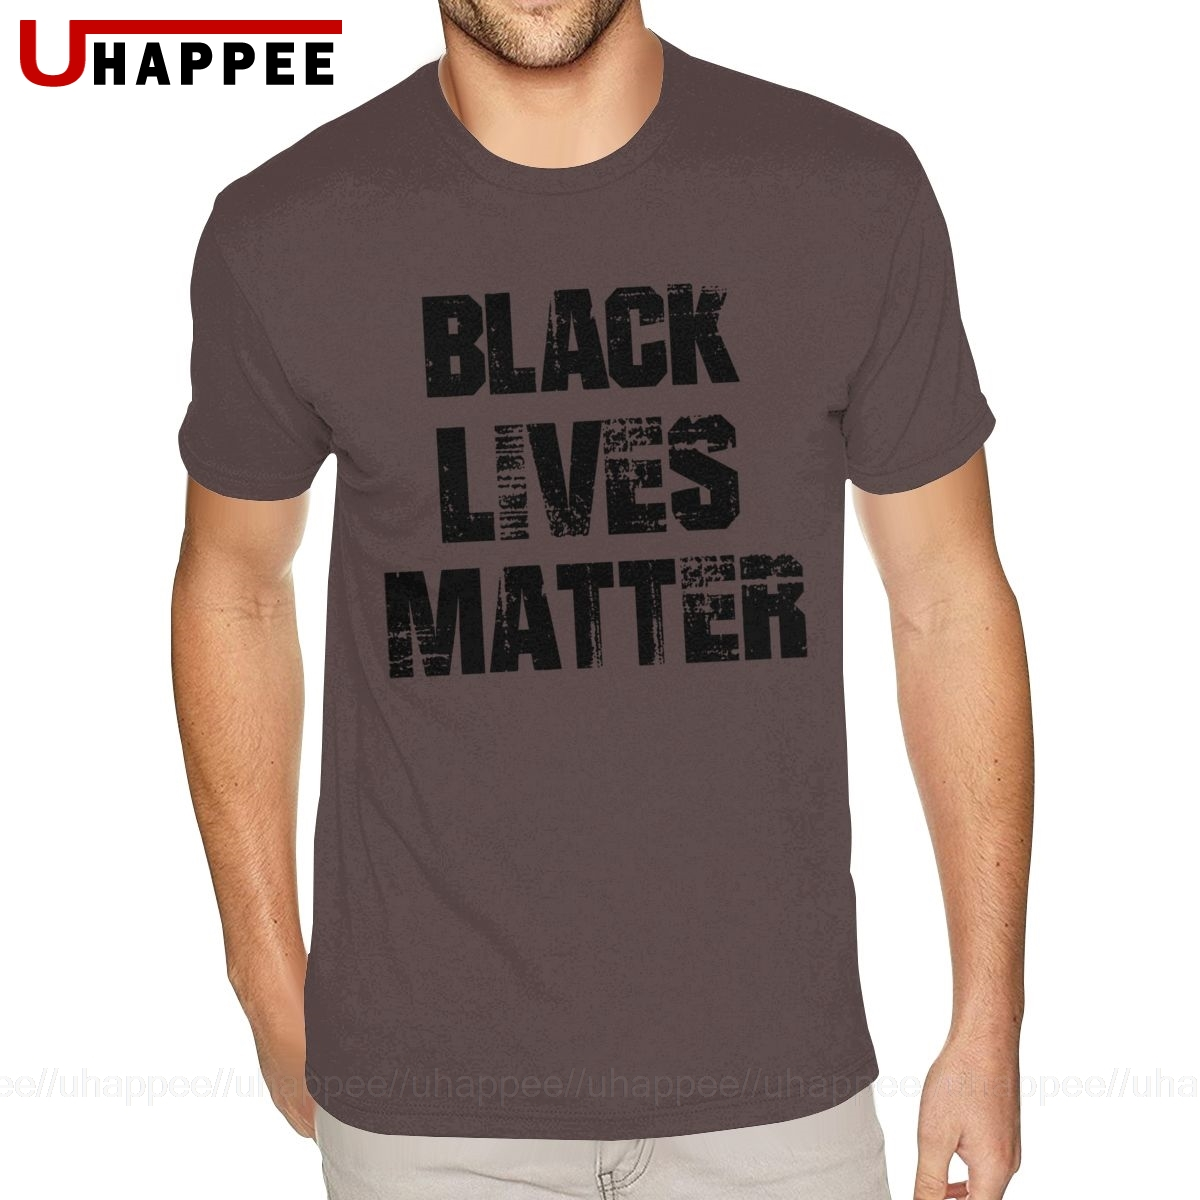 Mens Round Neck Black Lives Matter Short-Sleeve T-Shirts Tees